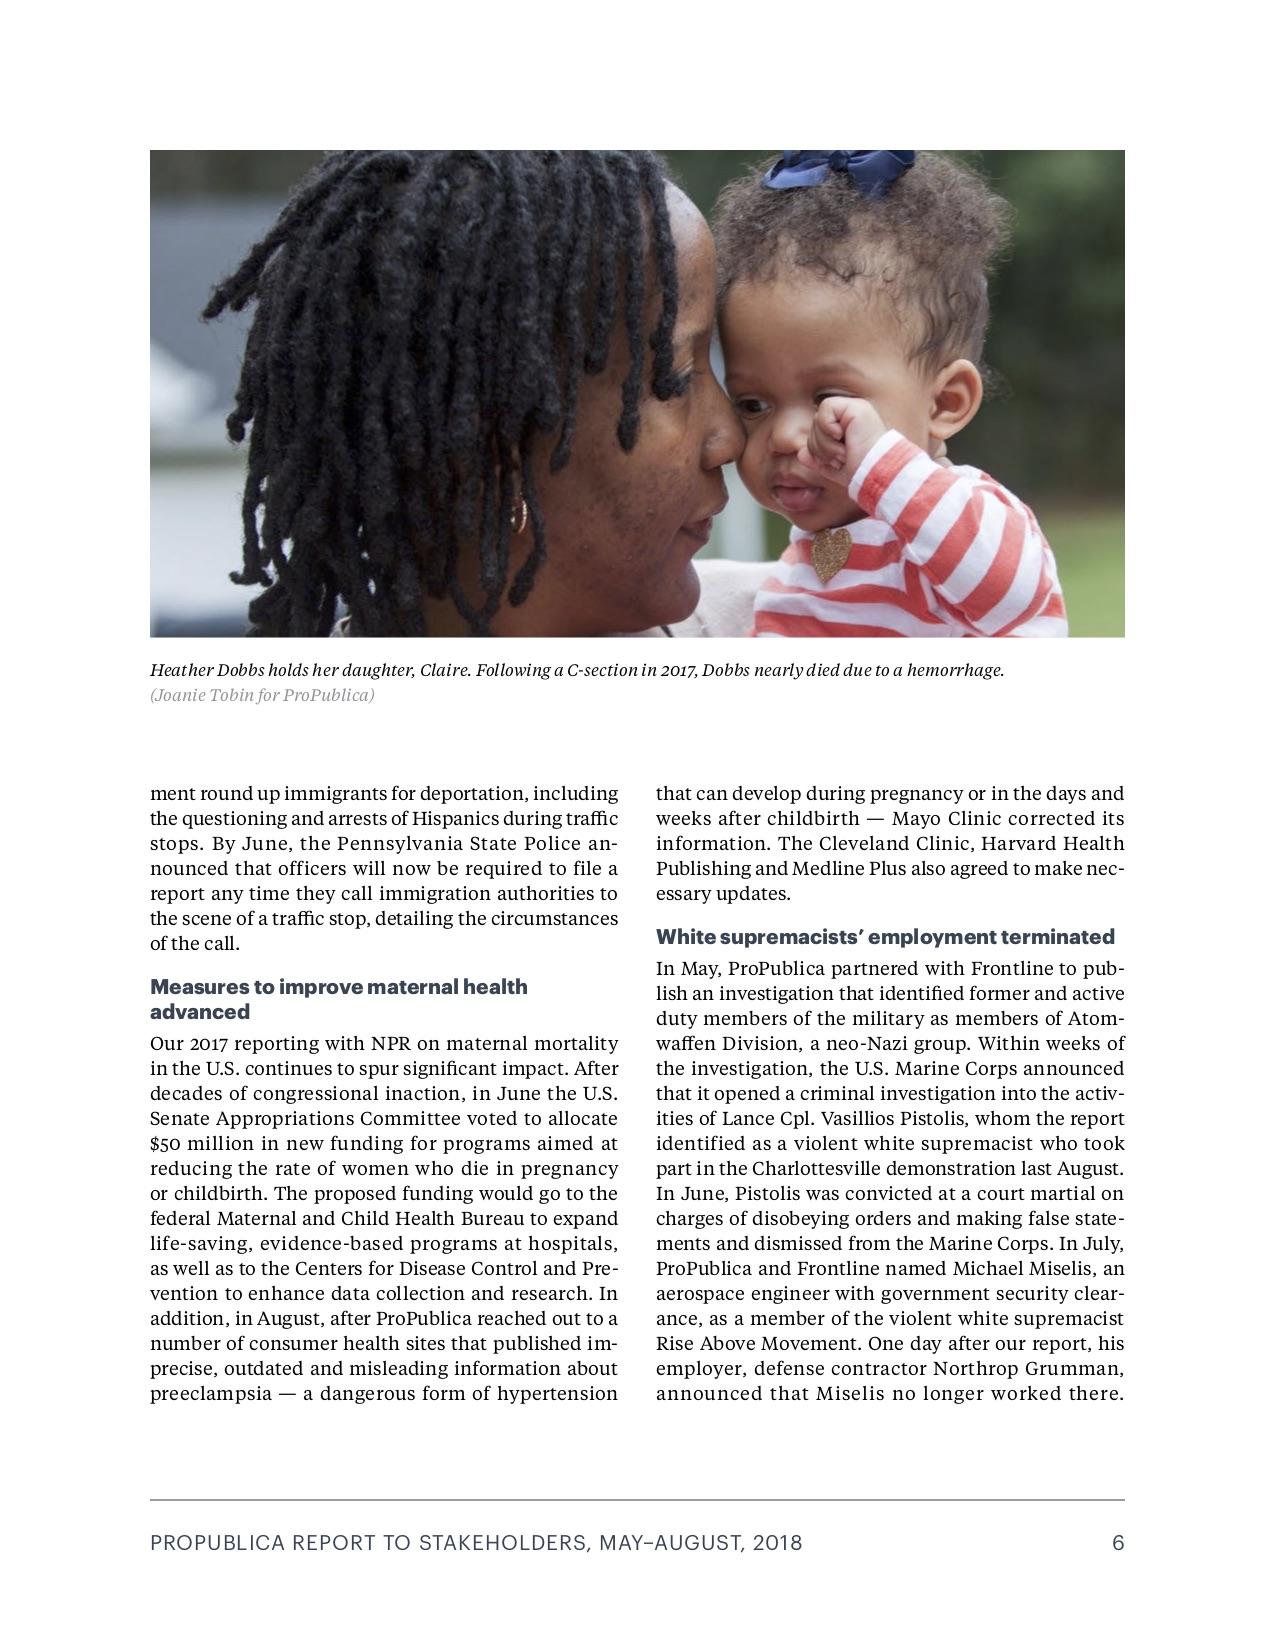 propublica-2018-2nd-interim-report 2 (dragged).jpg